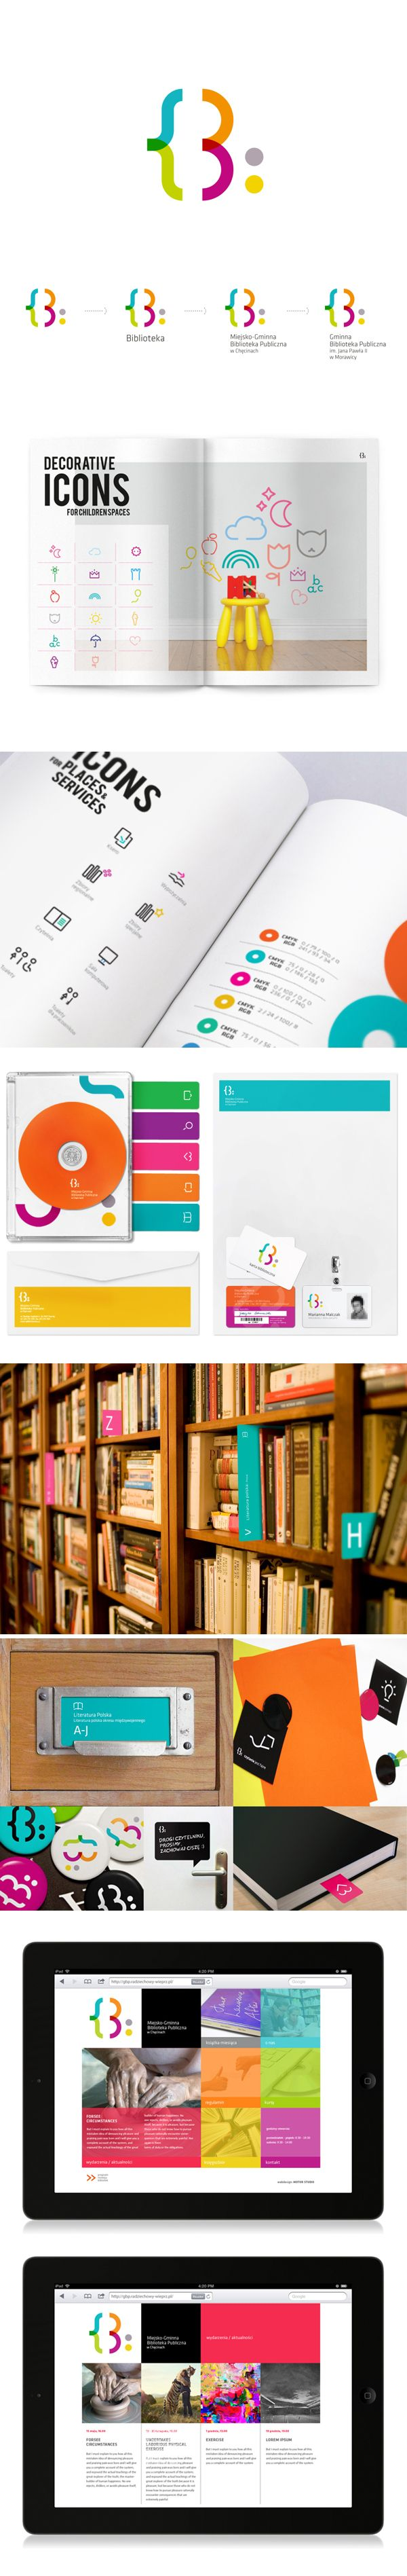 Biblioteka library {branding}                                                                                                                                                                                 More